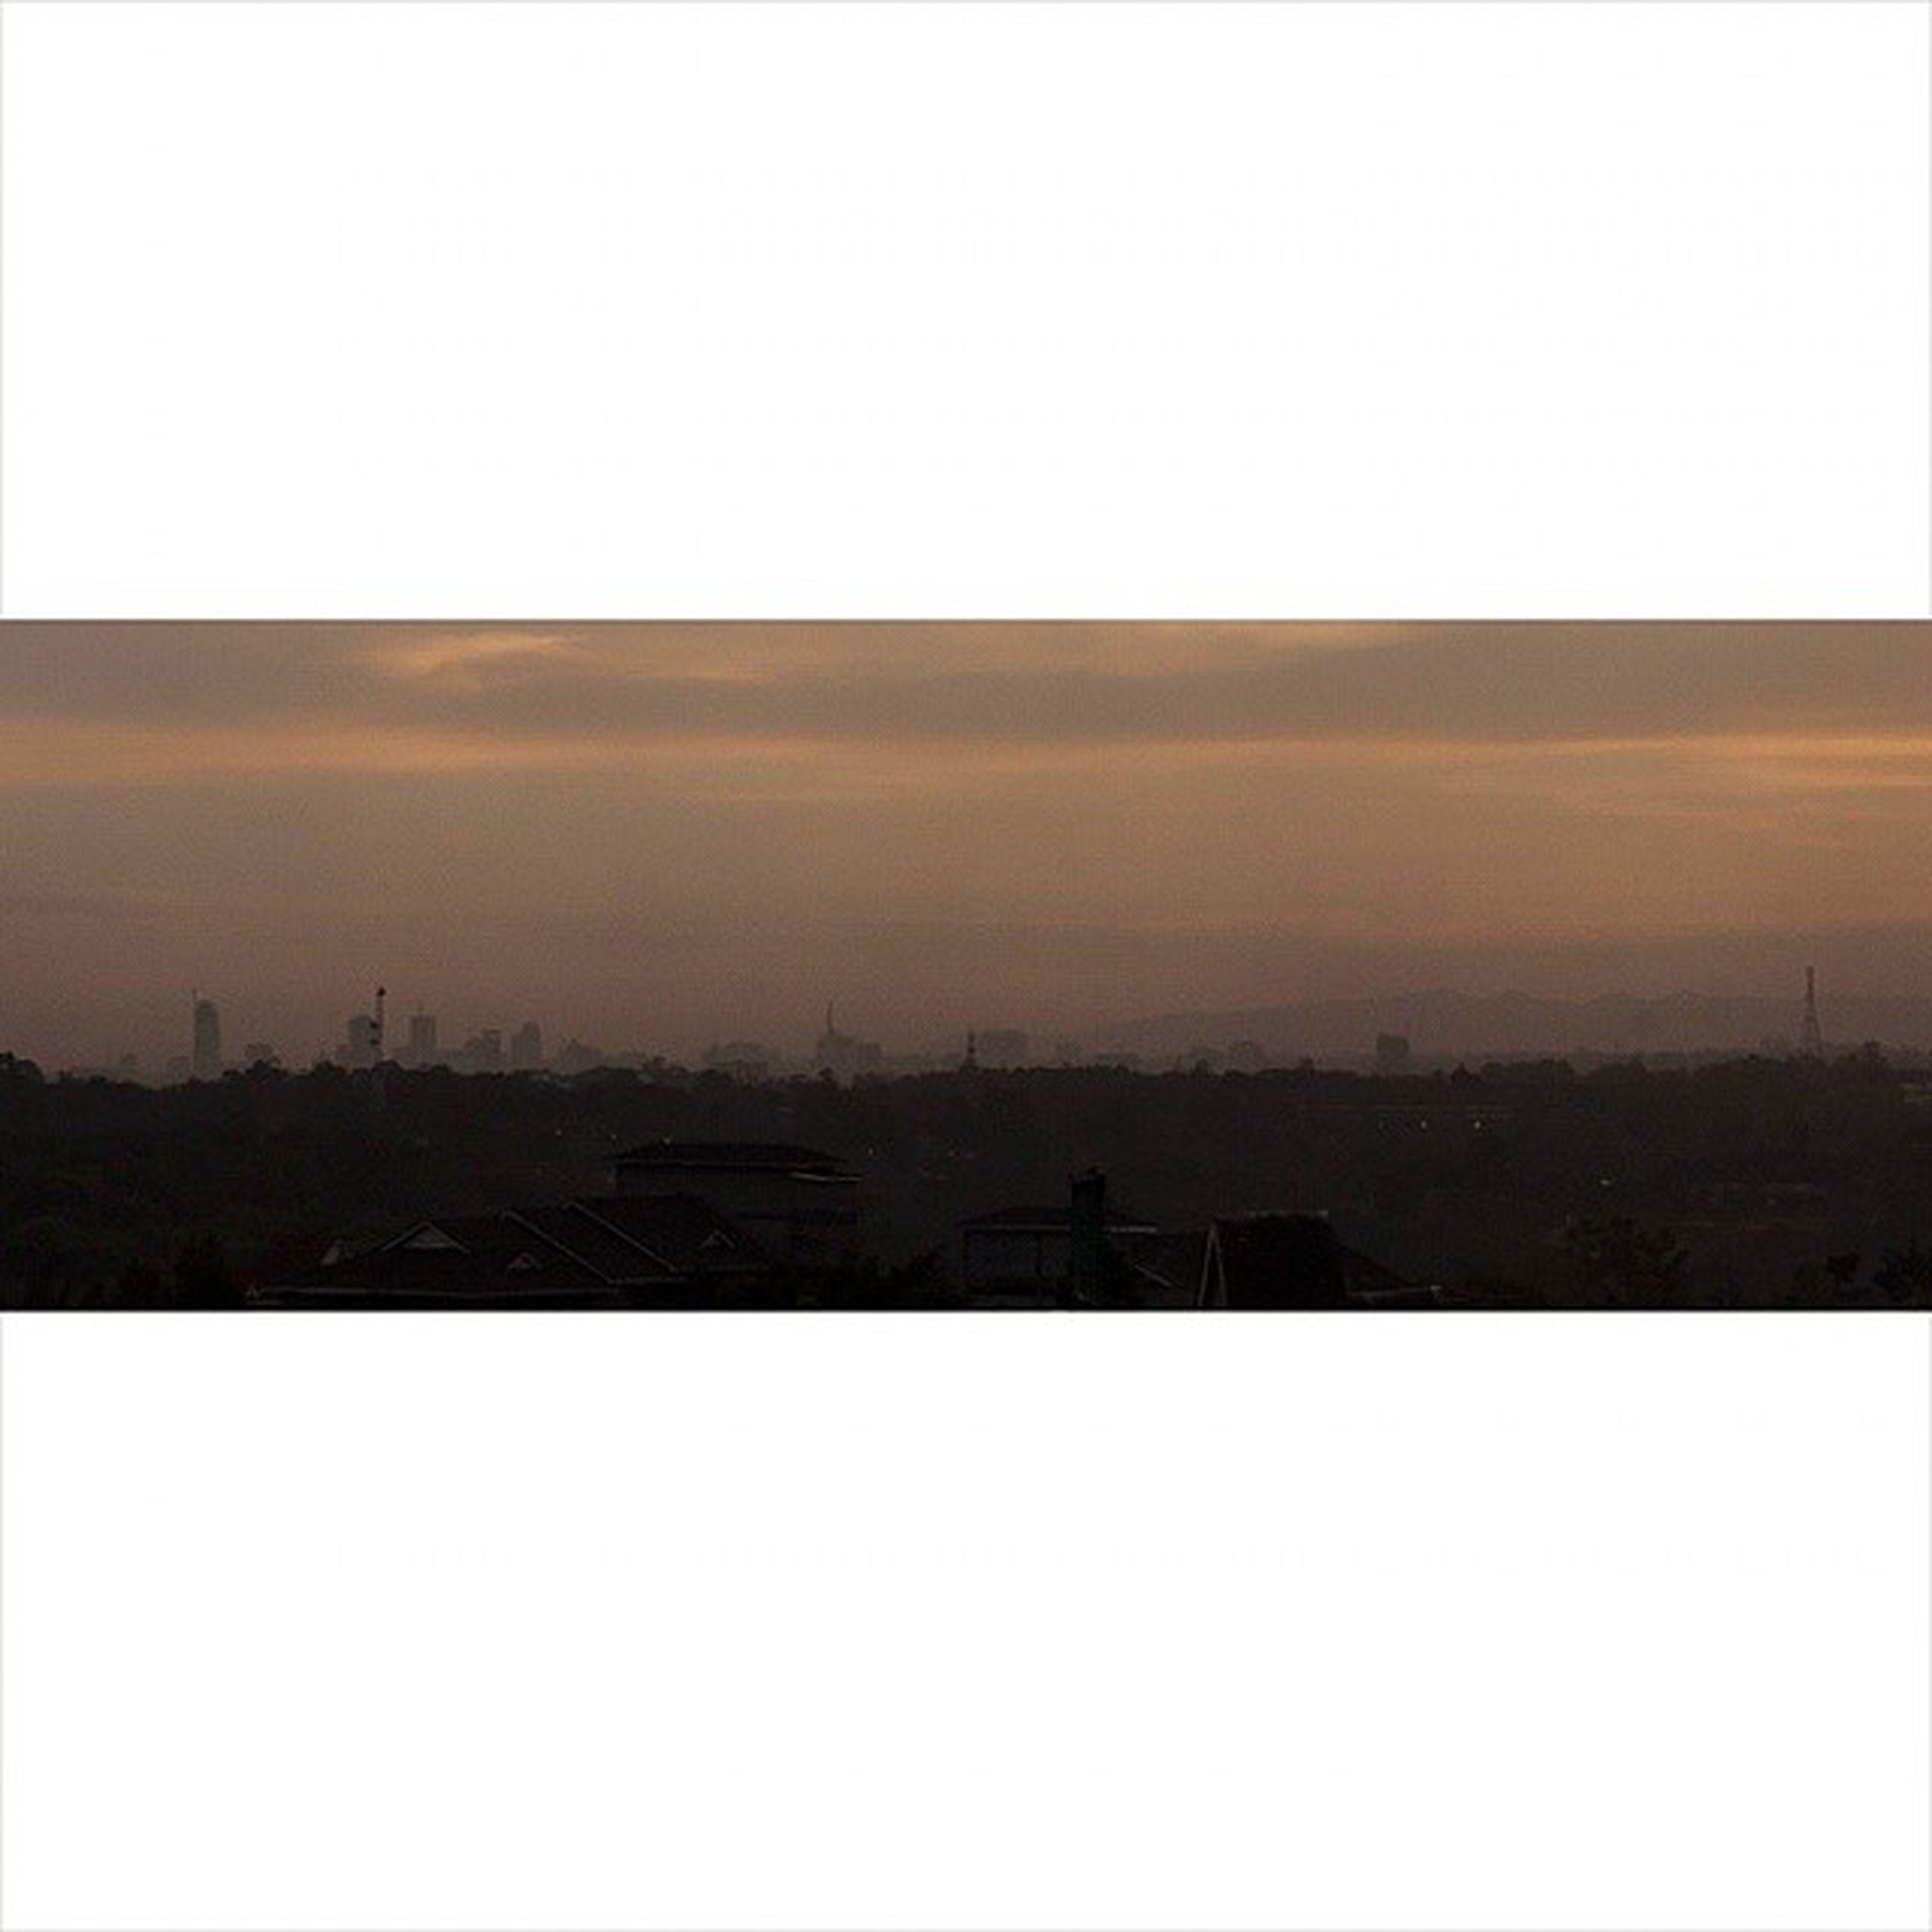 The city beyond. My city. LoveNairobi Igersnairobi Igkenya Igerske PotDay Seenairobi Cityscape